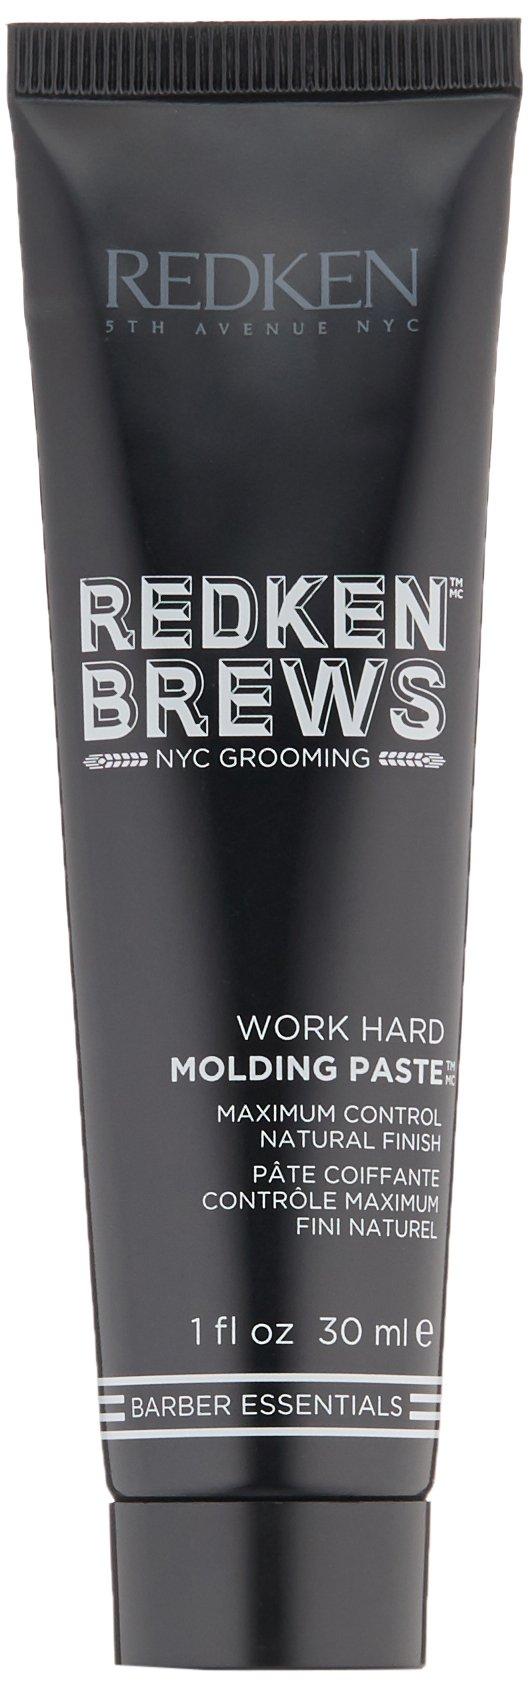 Redken Brews Molding Paste, 1.0 fl. oz.